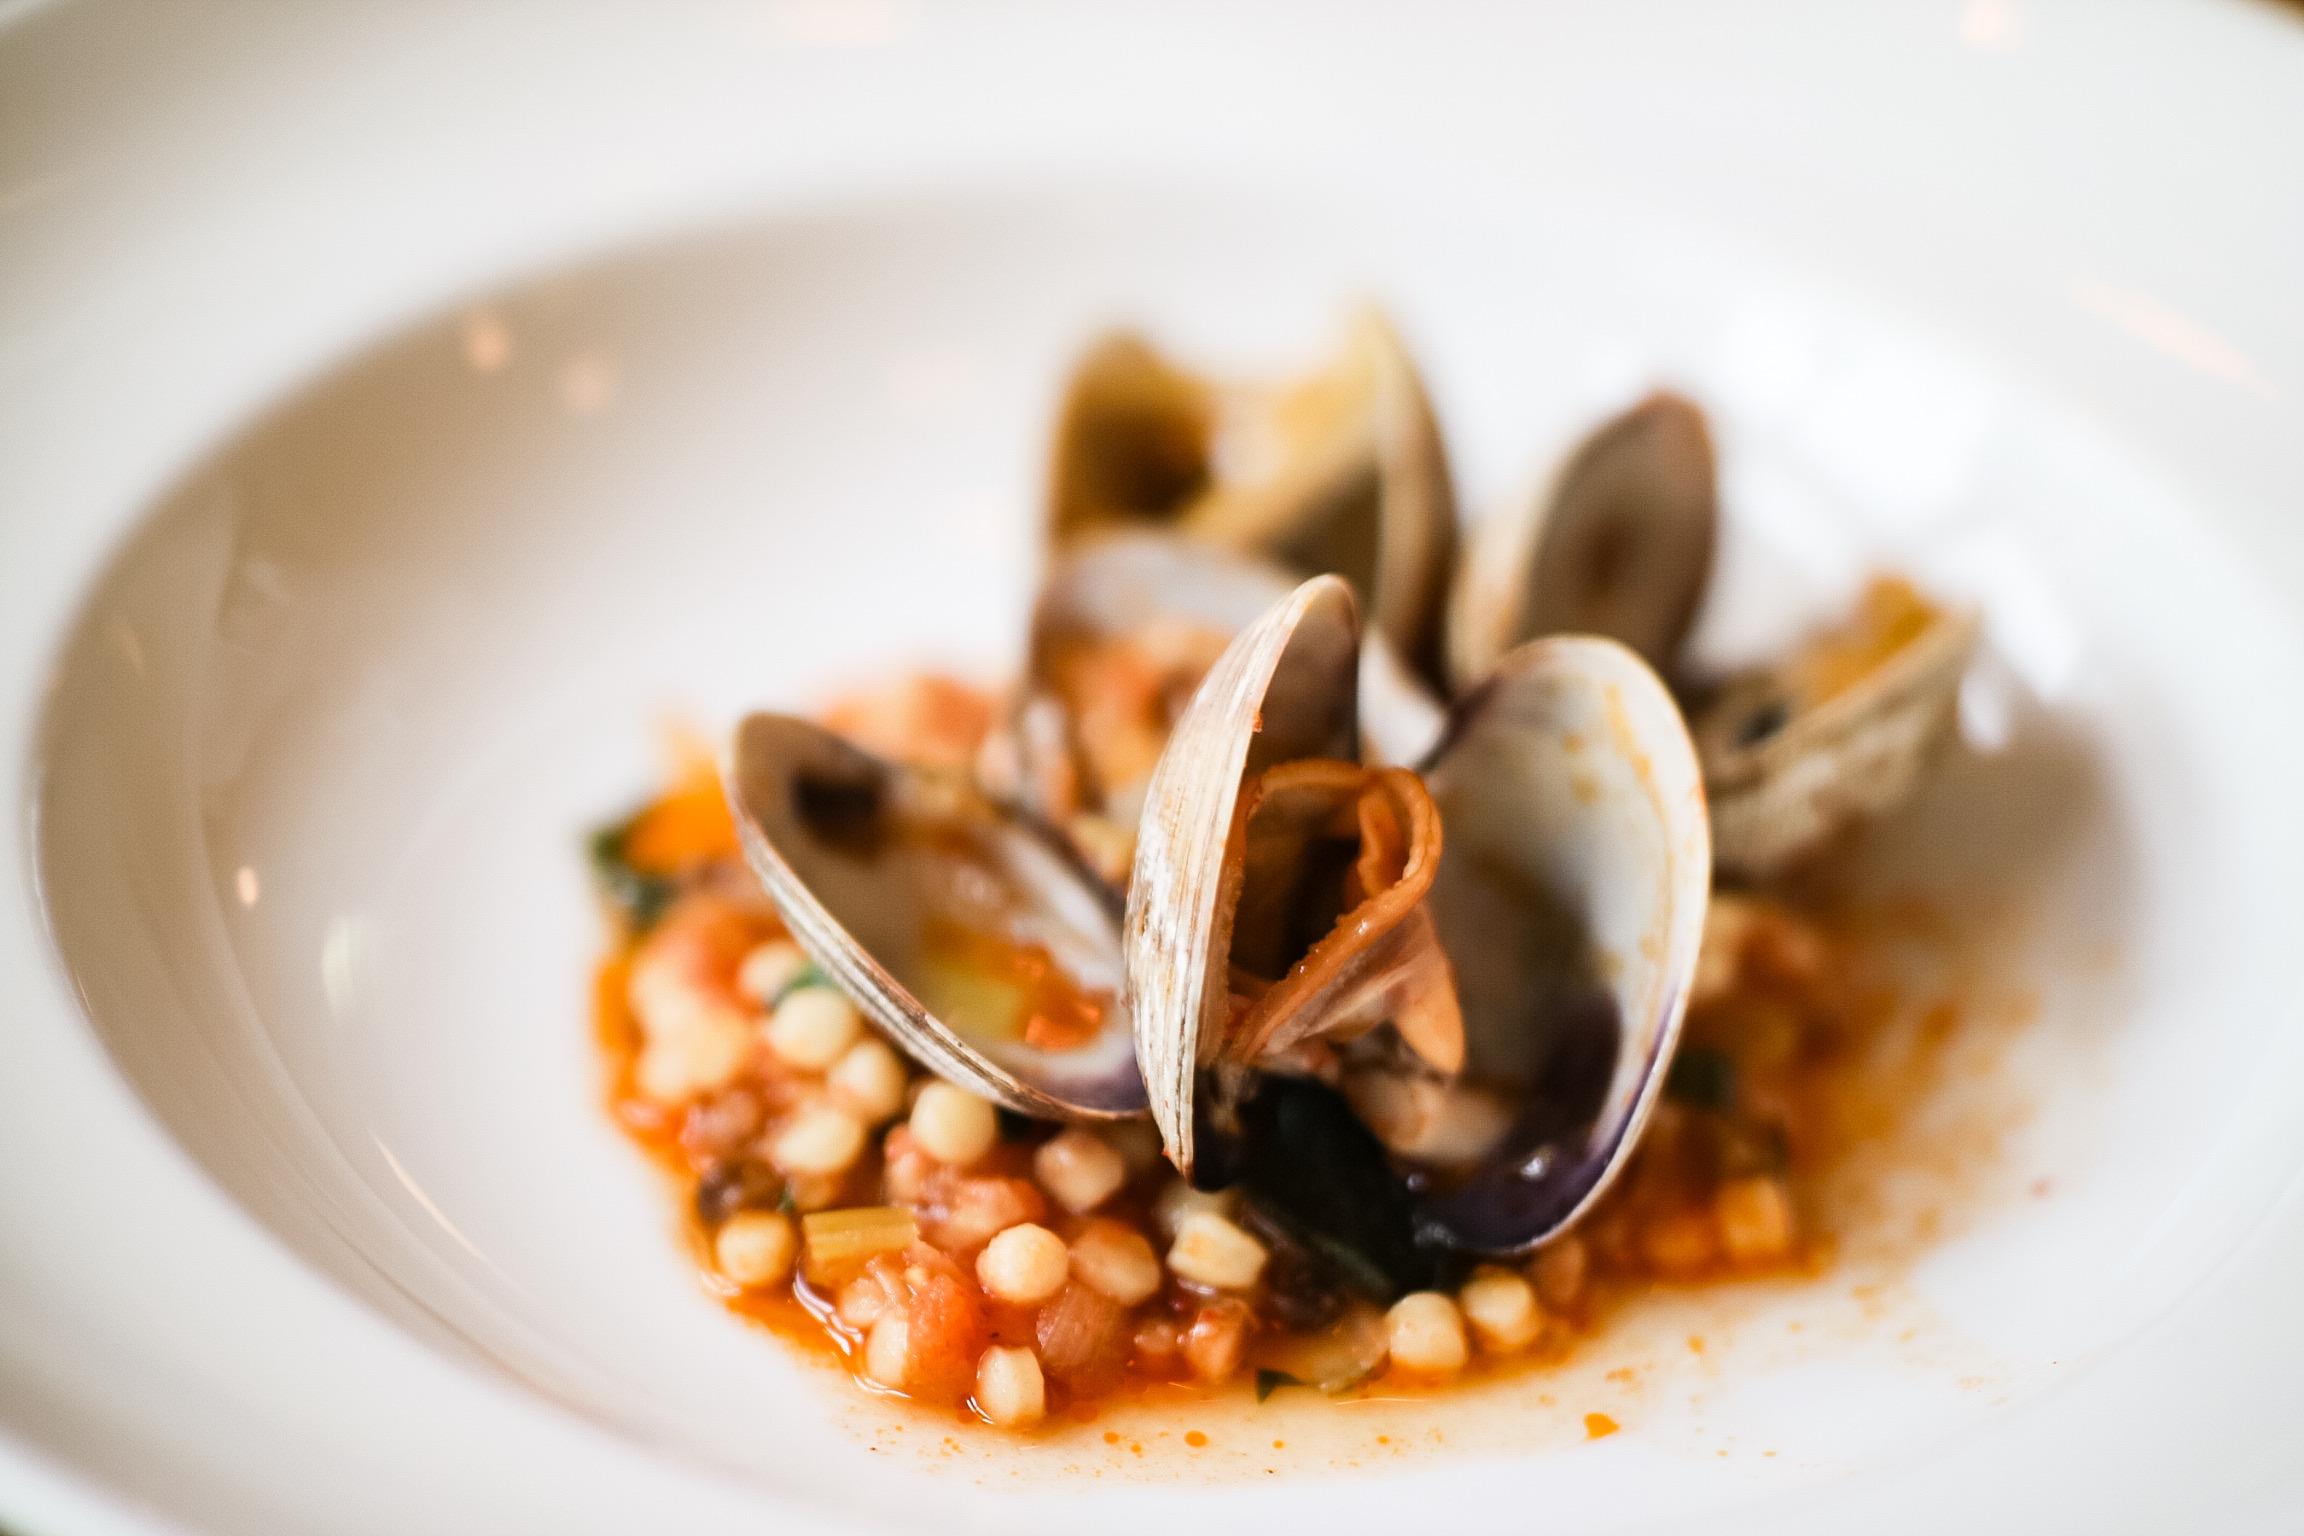 Fregola, clams, preserved tomato, chili